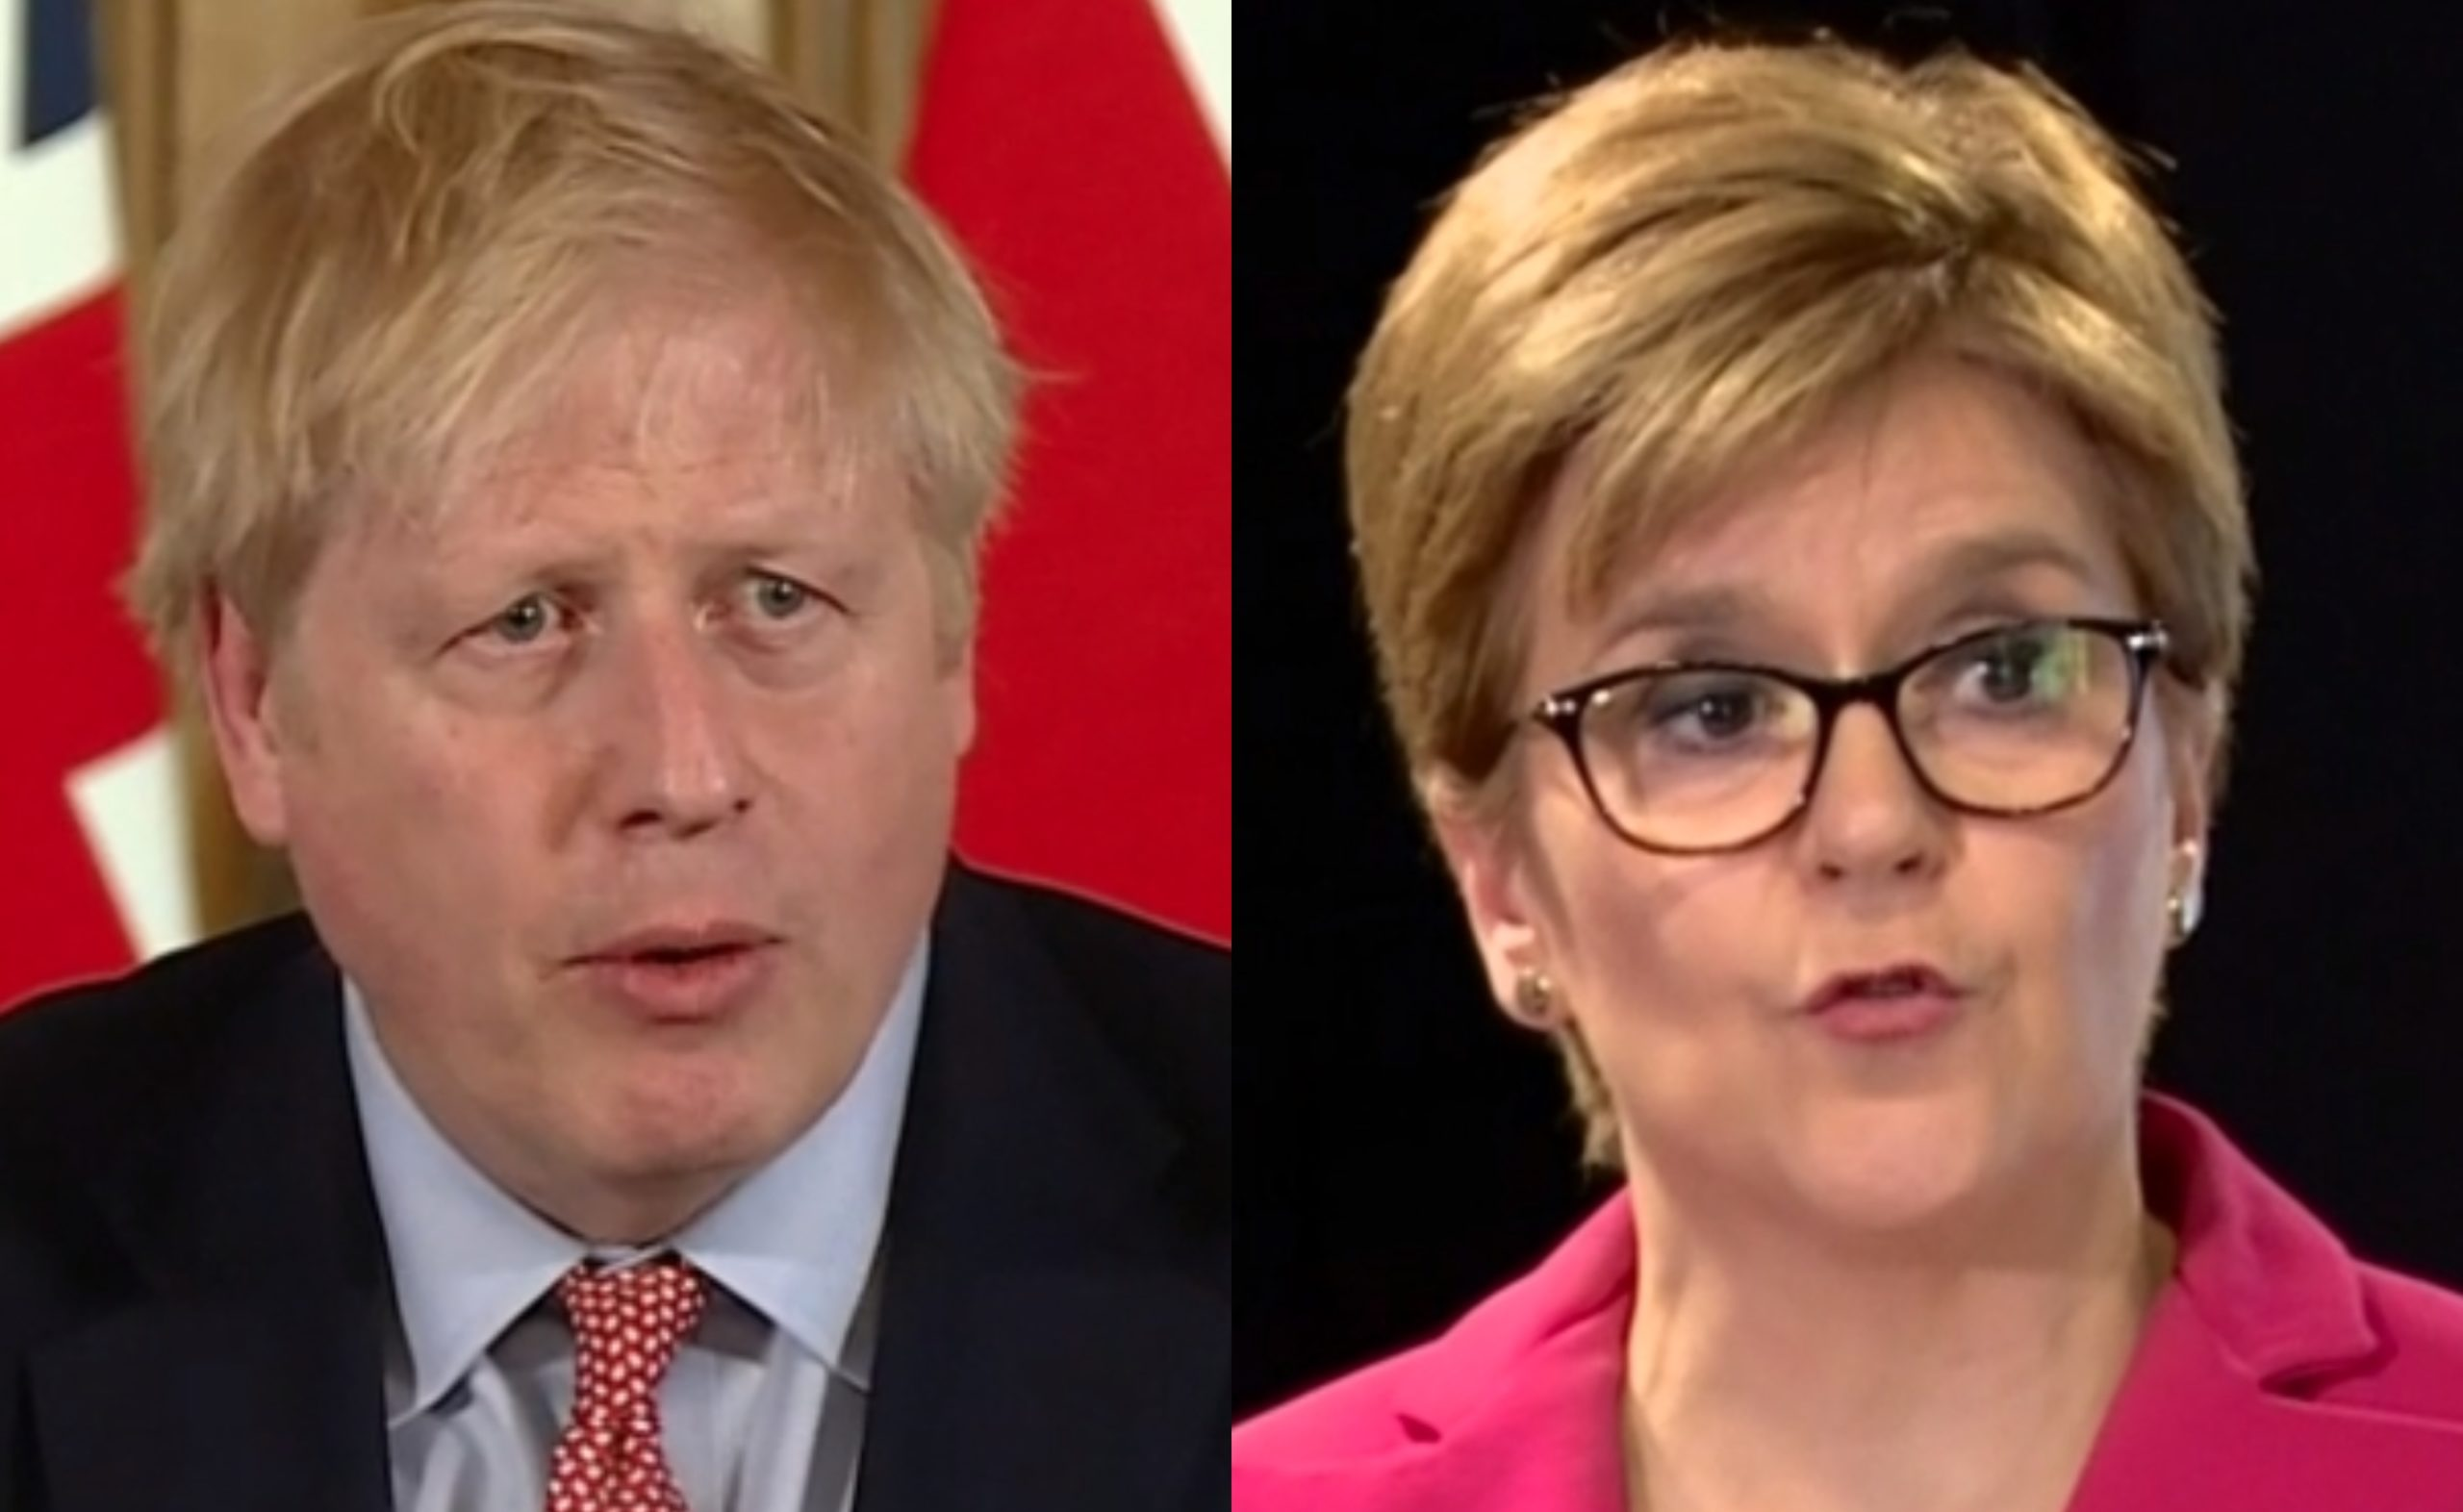 Boris Johnson and Nicola Sturgeon both provided updates on coronavirus.